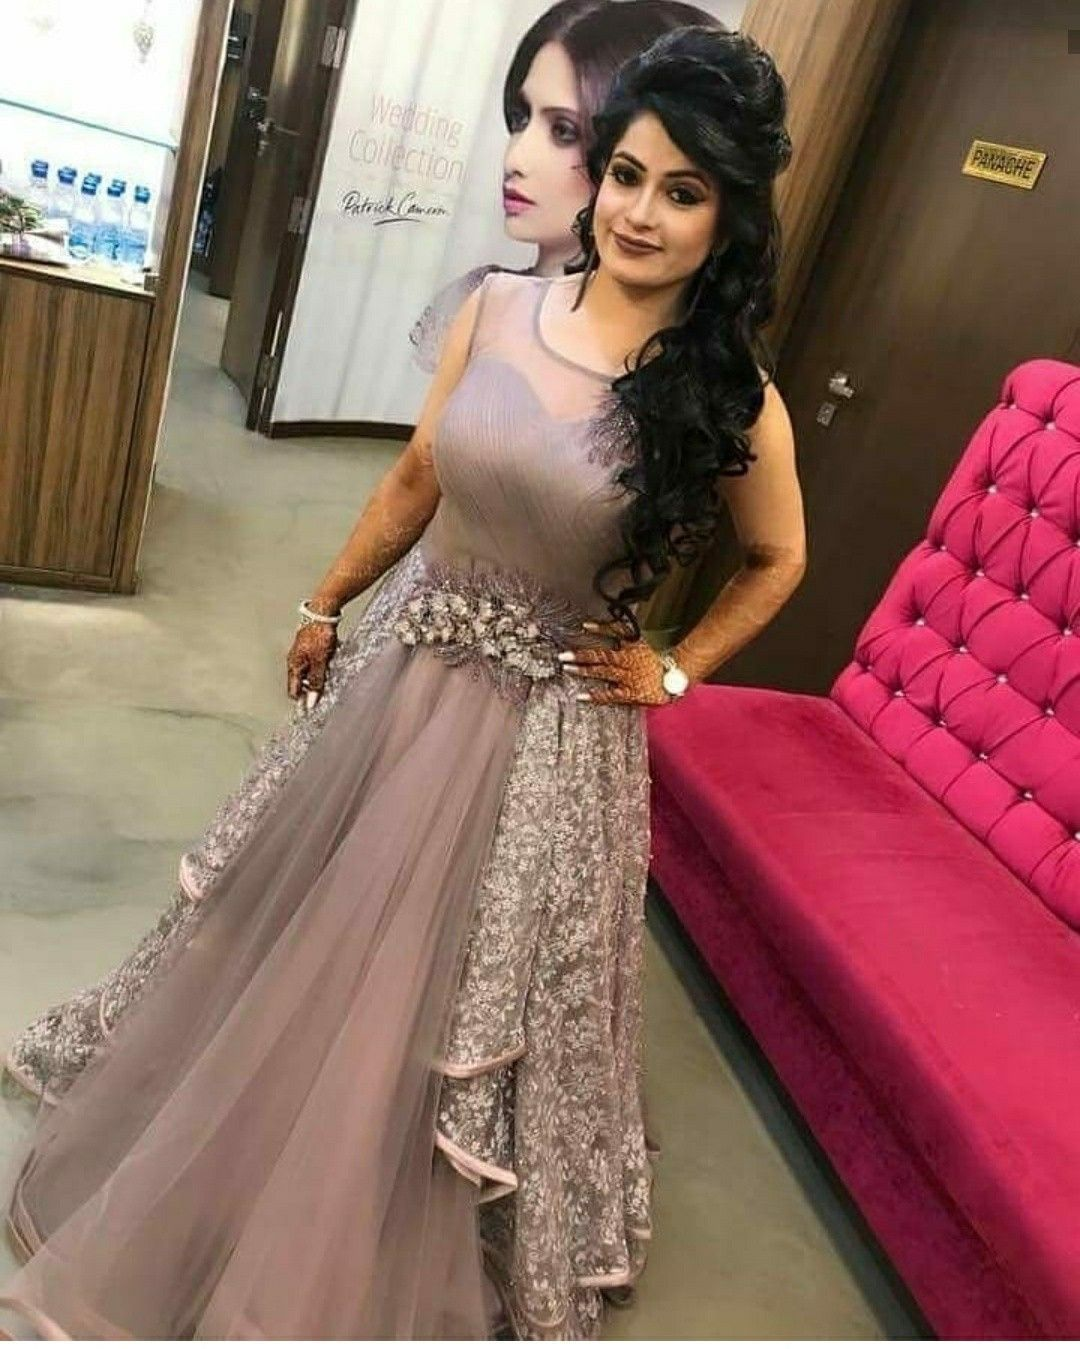 17 Devastatingly Cool Indian Hairstyles Anarkali Bridal Lehe Indian Hairstyles Hairstyles For Gowns Indian Gowns Dresses Indian Wedding Gowns